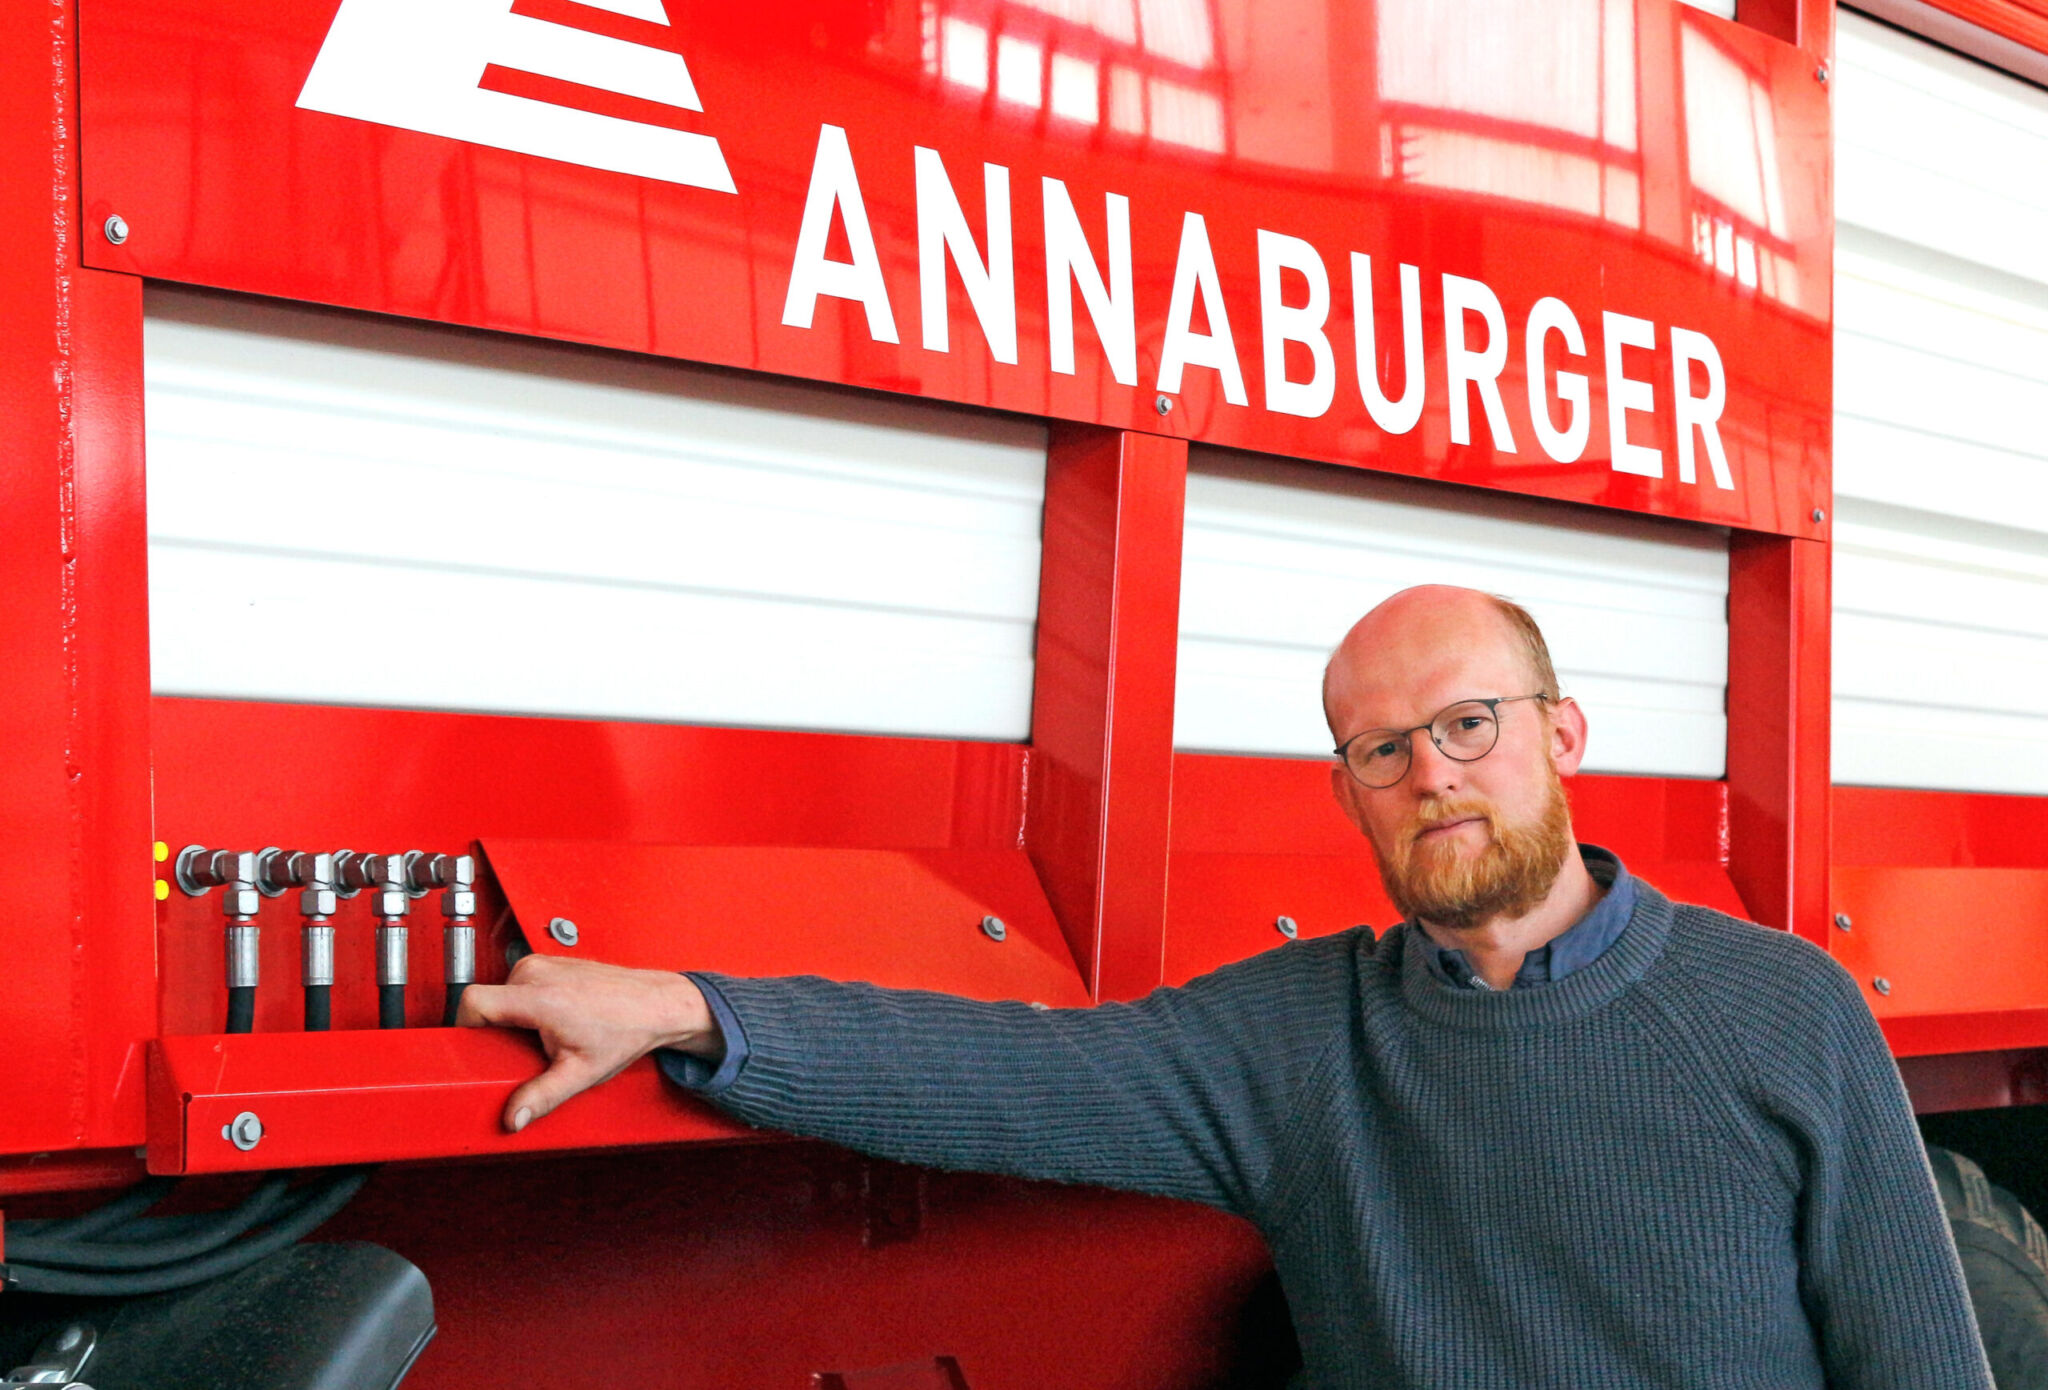 Jan Schulz Annaburger |copyright: Annaburger Nutzfahrzeuge GmbH